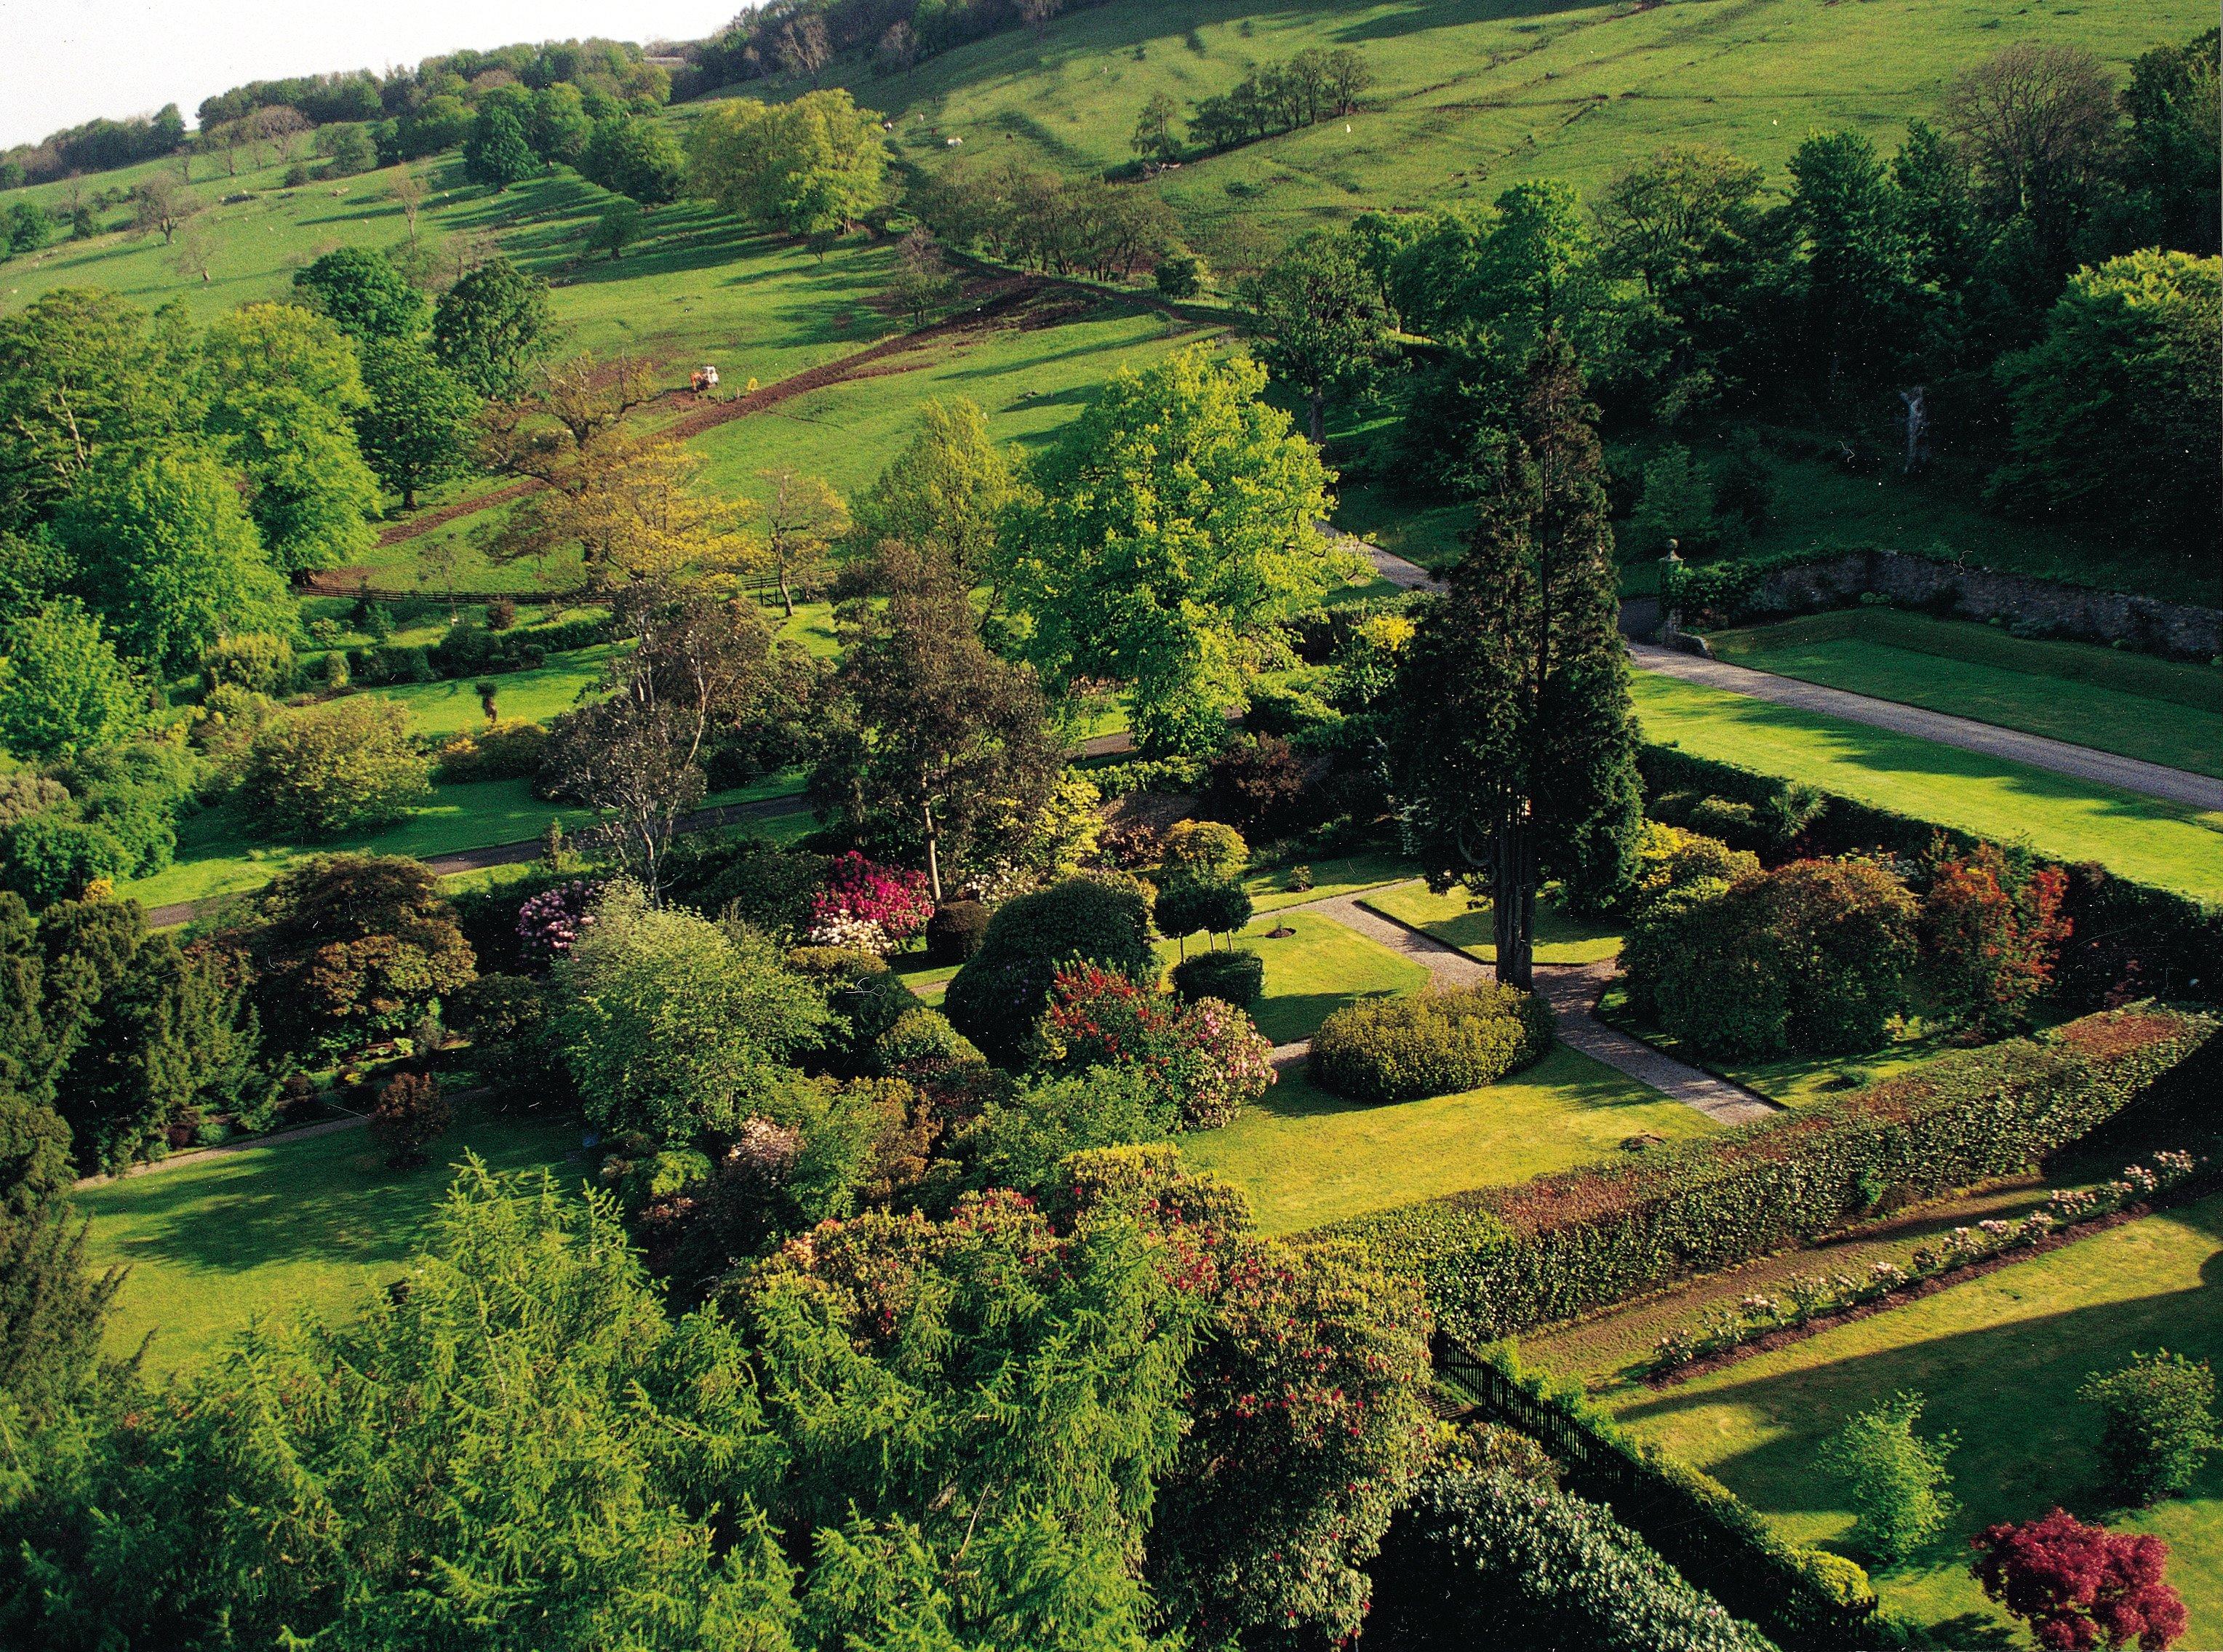 The Plaisance (Walled Garden)